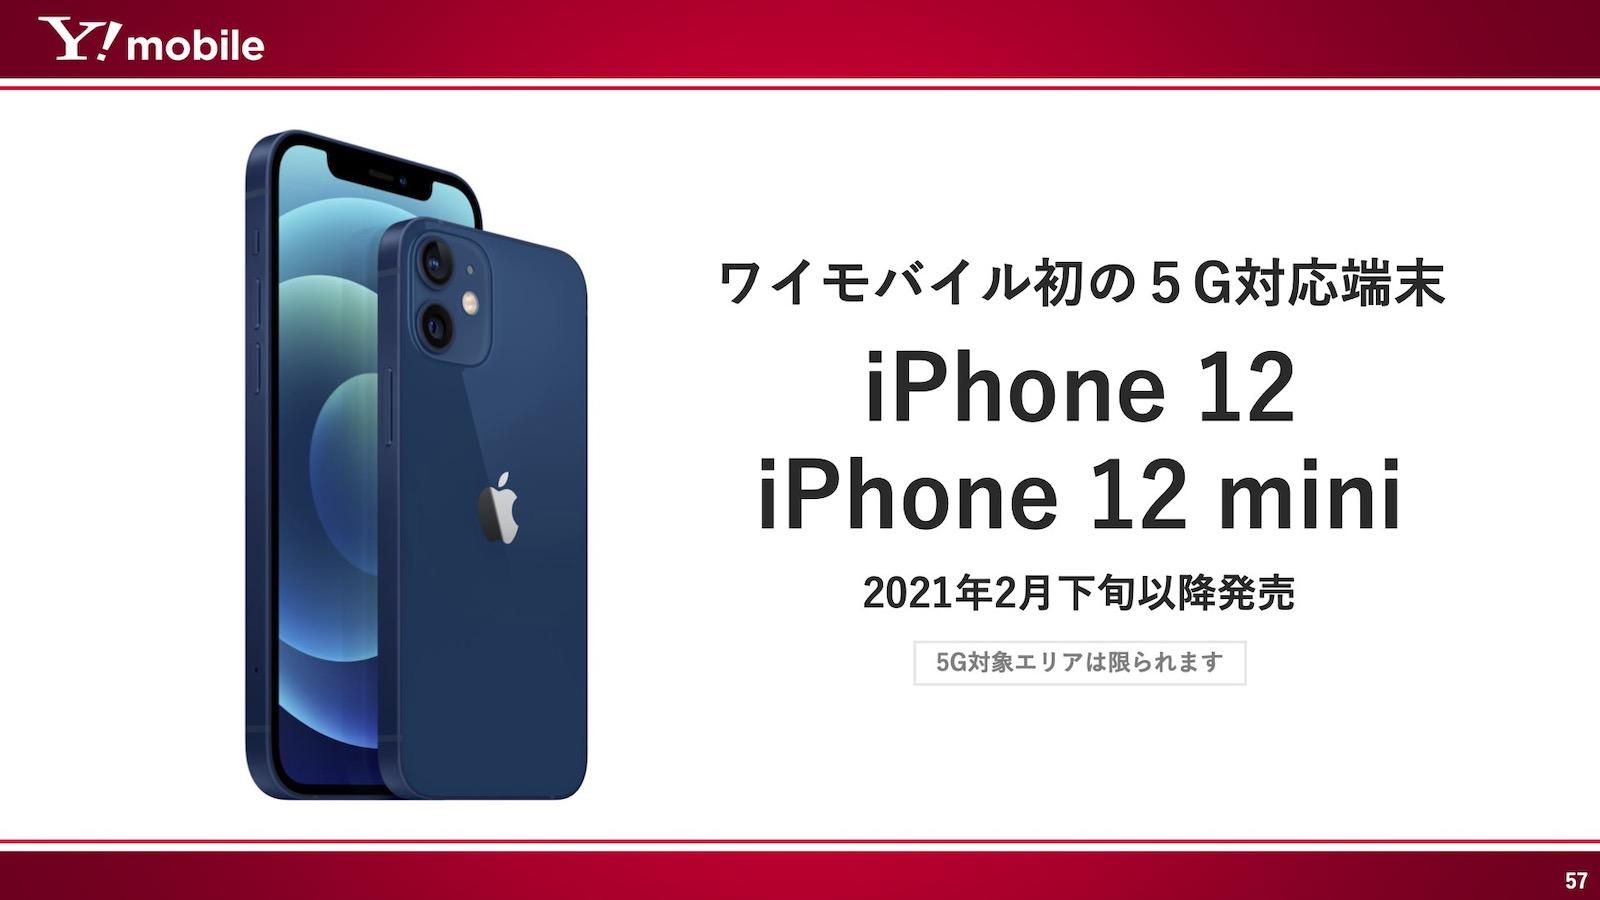 Ymobile iphone12 and iphone12mini